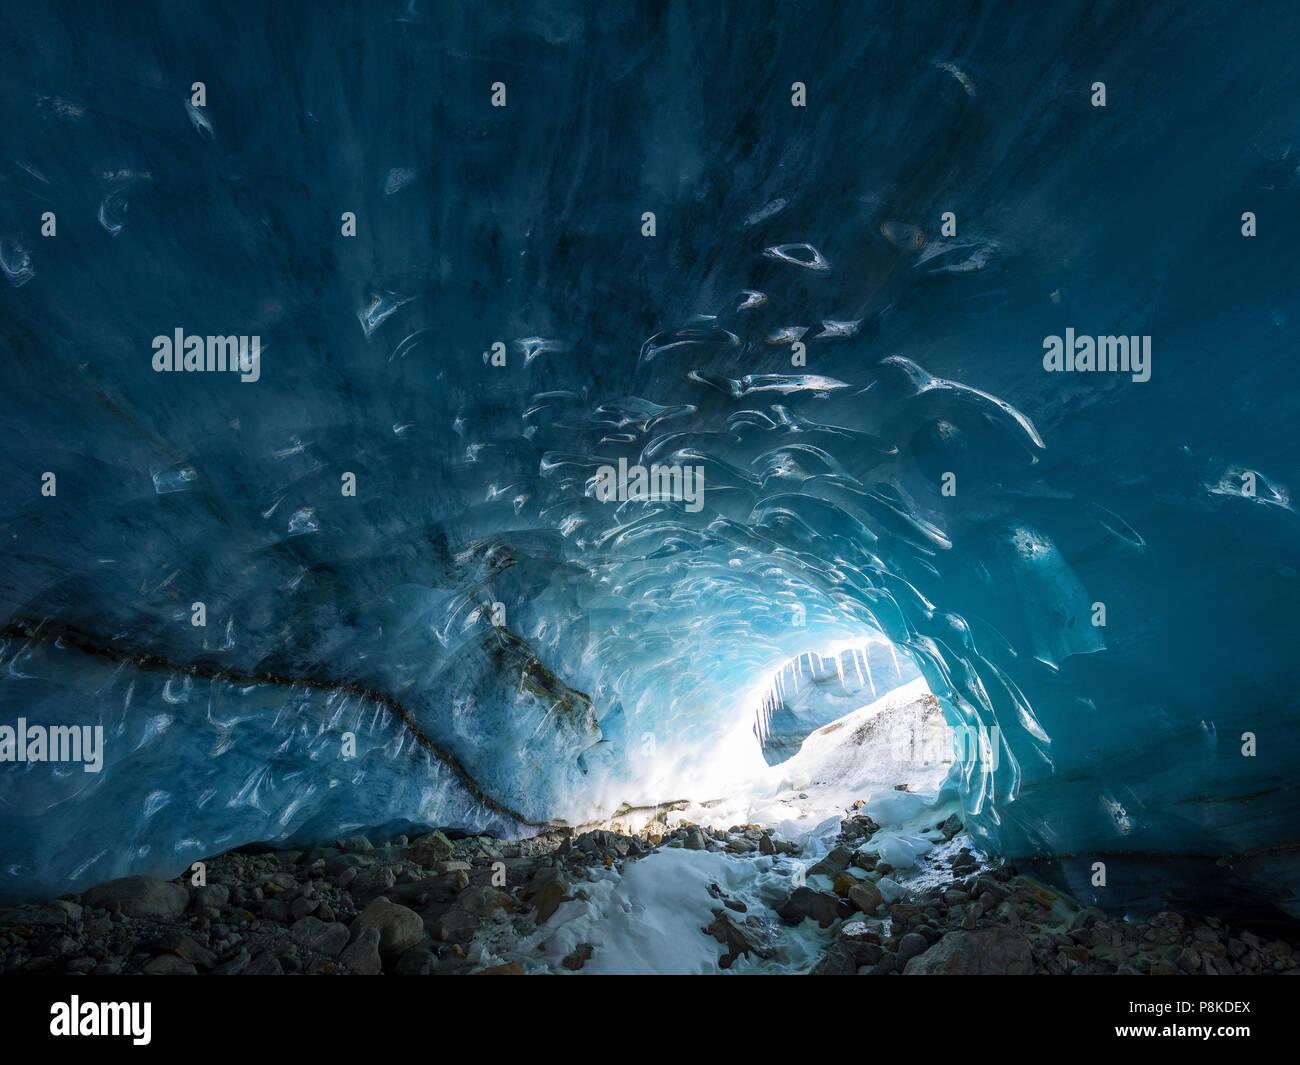 ice-cave-P8KDEX.jpg